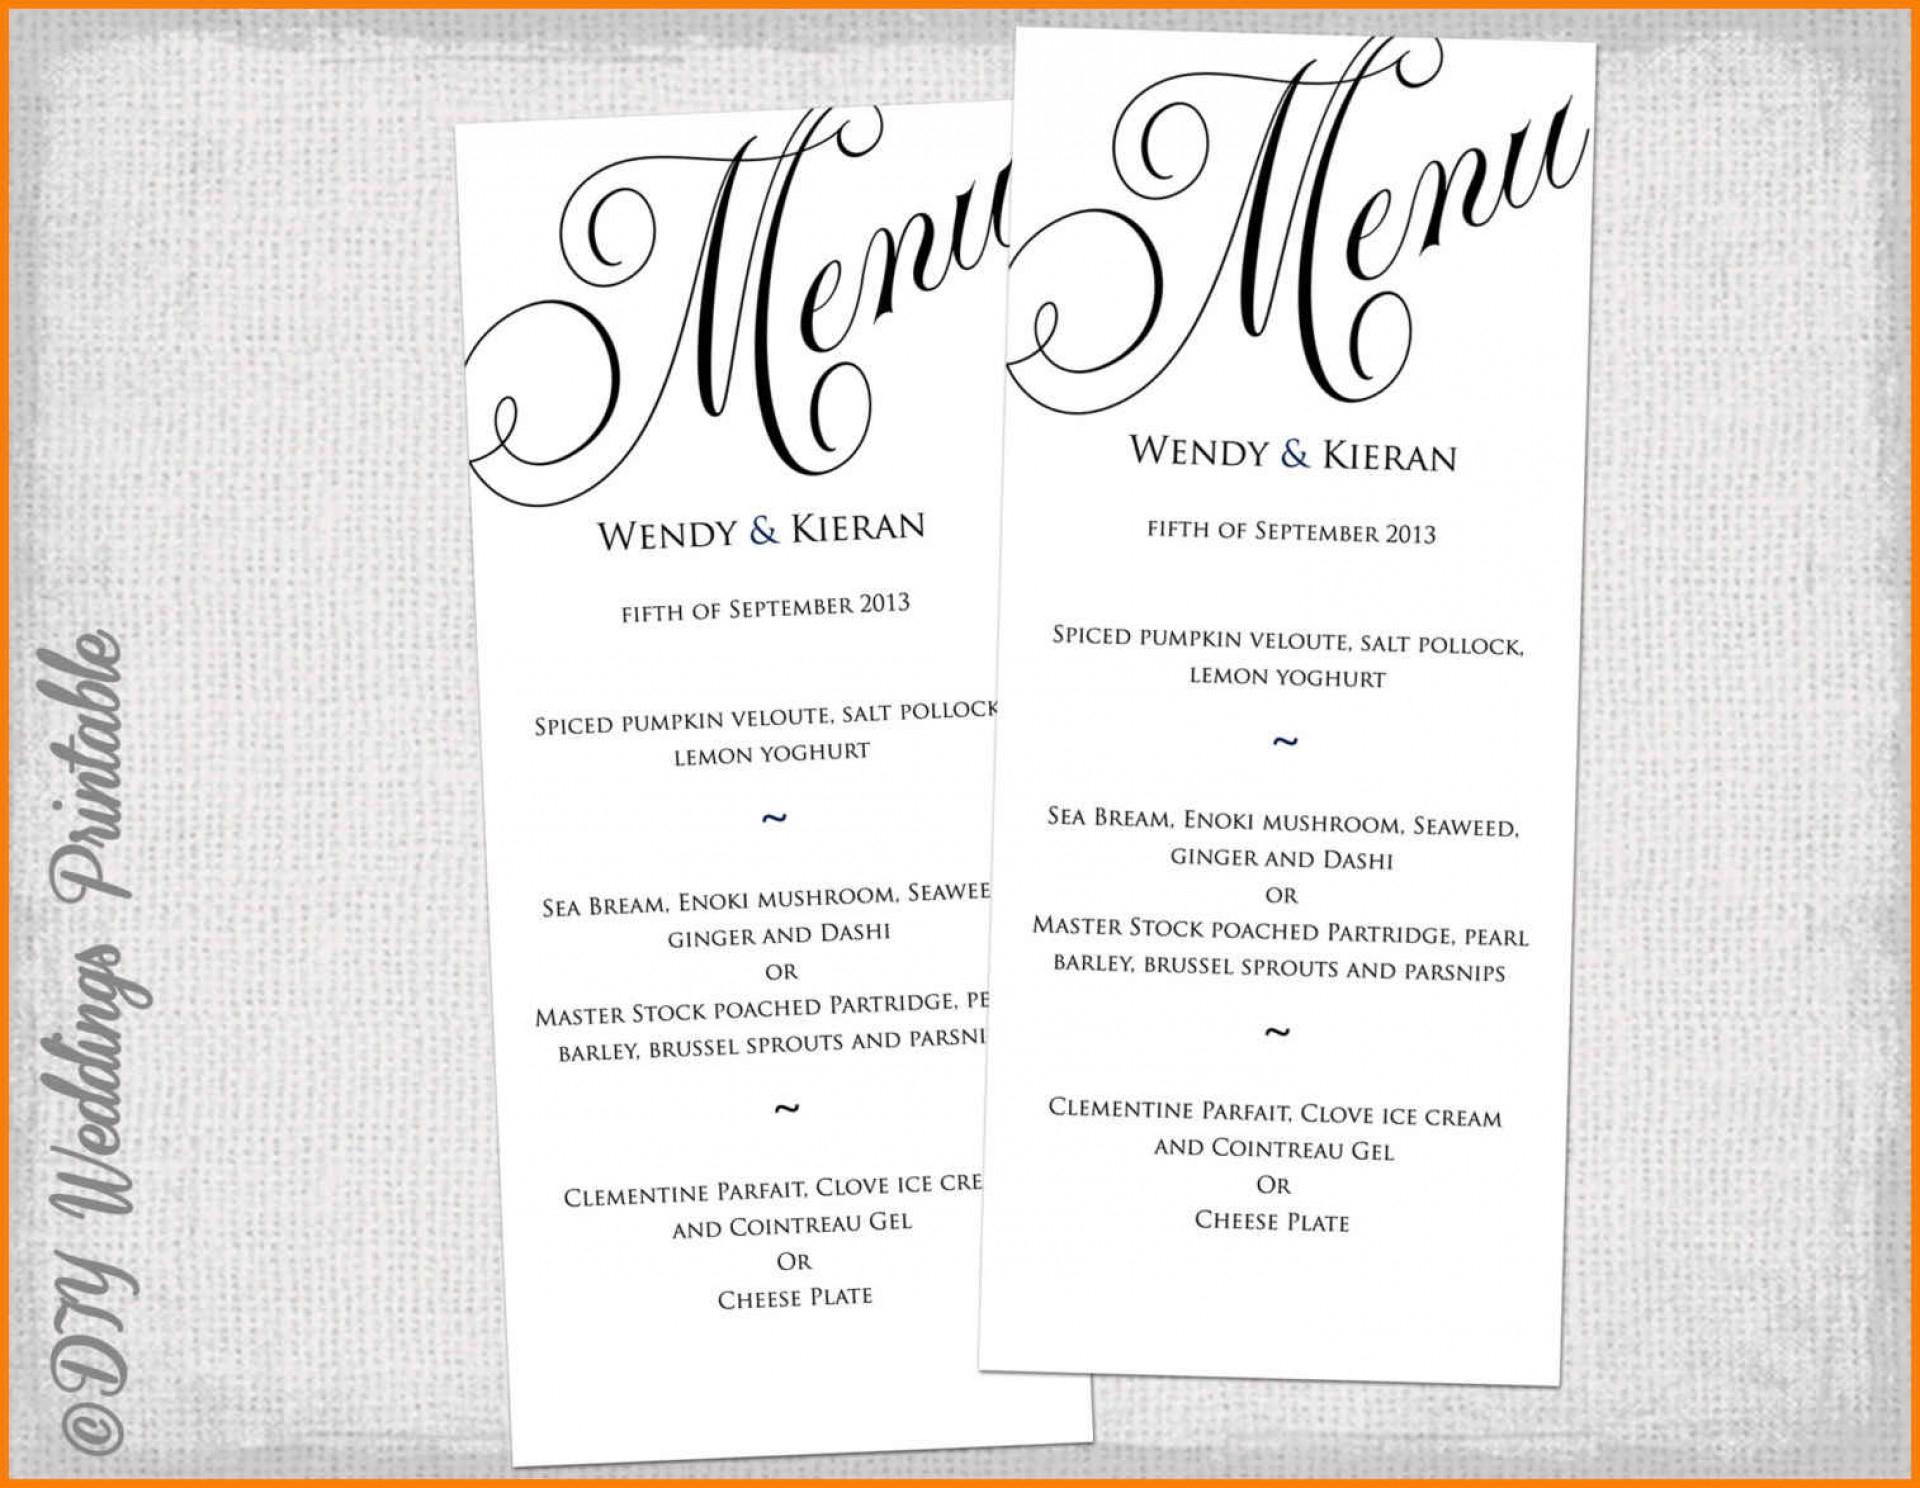 004 Dinner Party Menu Templates Template Ideas Elegant Leaflet - Free Printable Dinner Party Menu Template